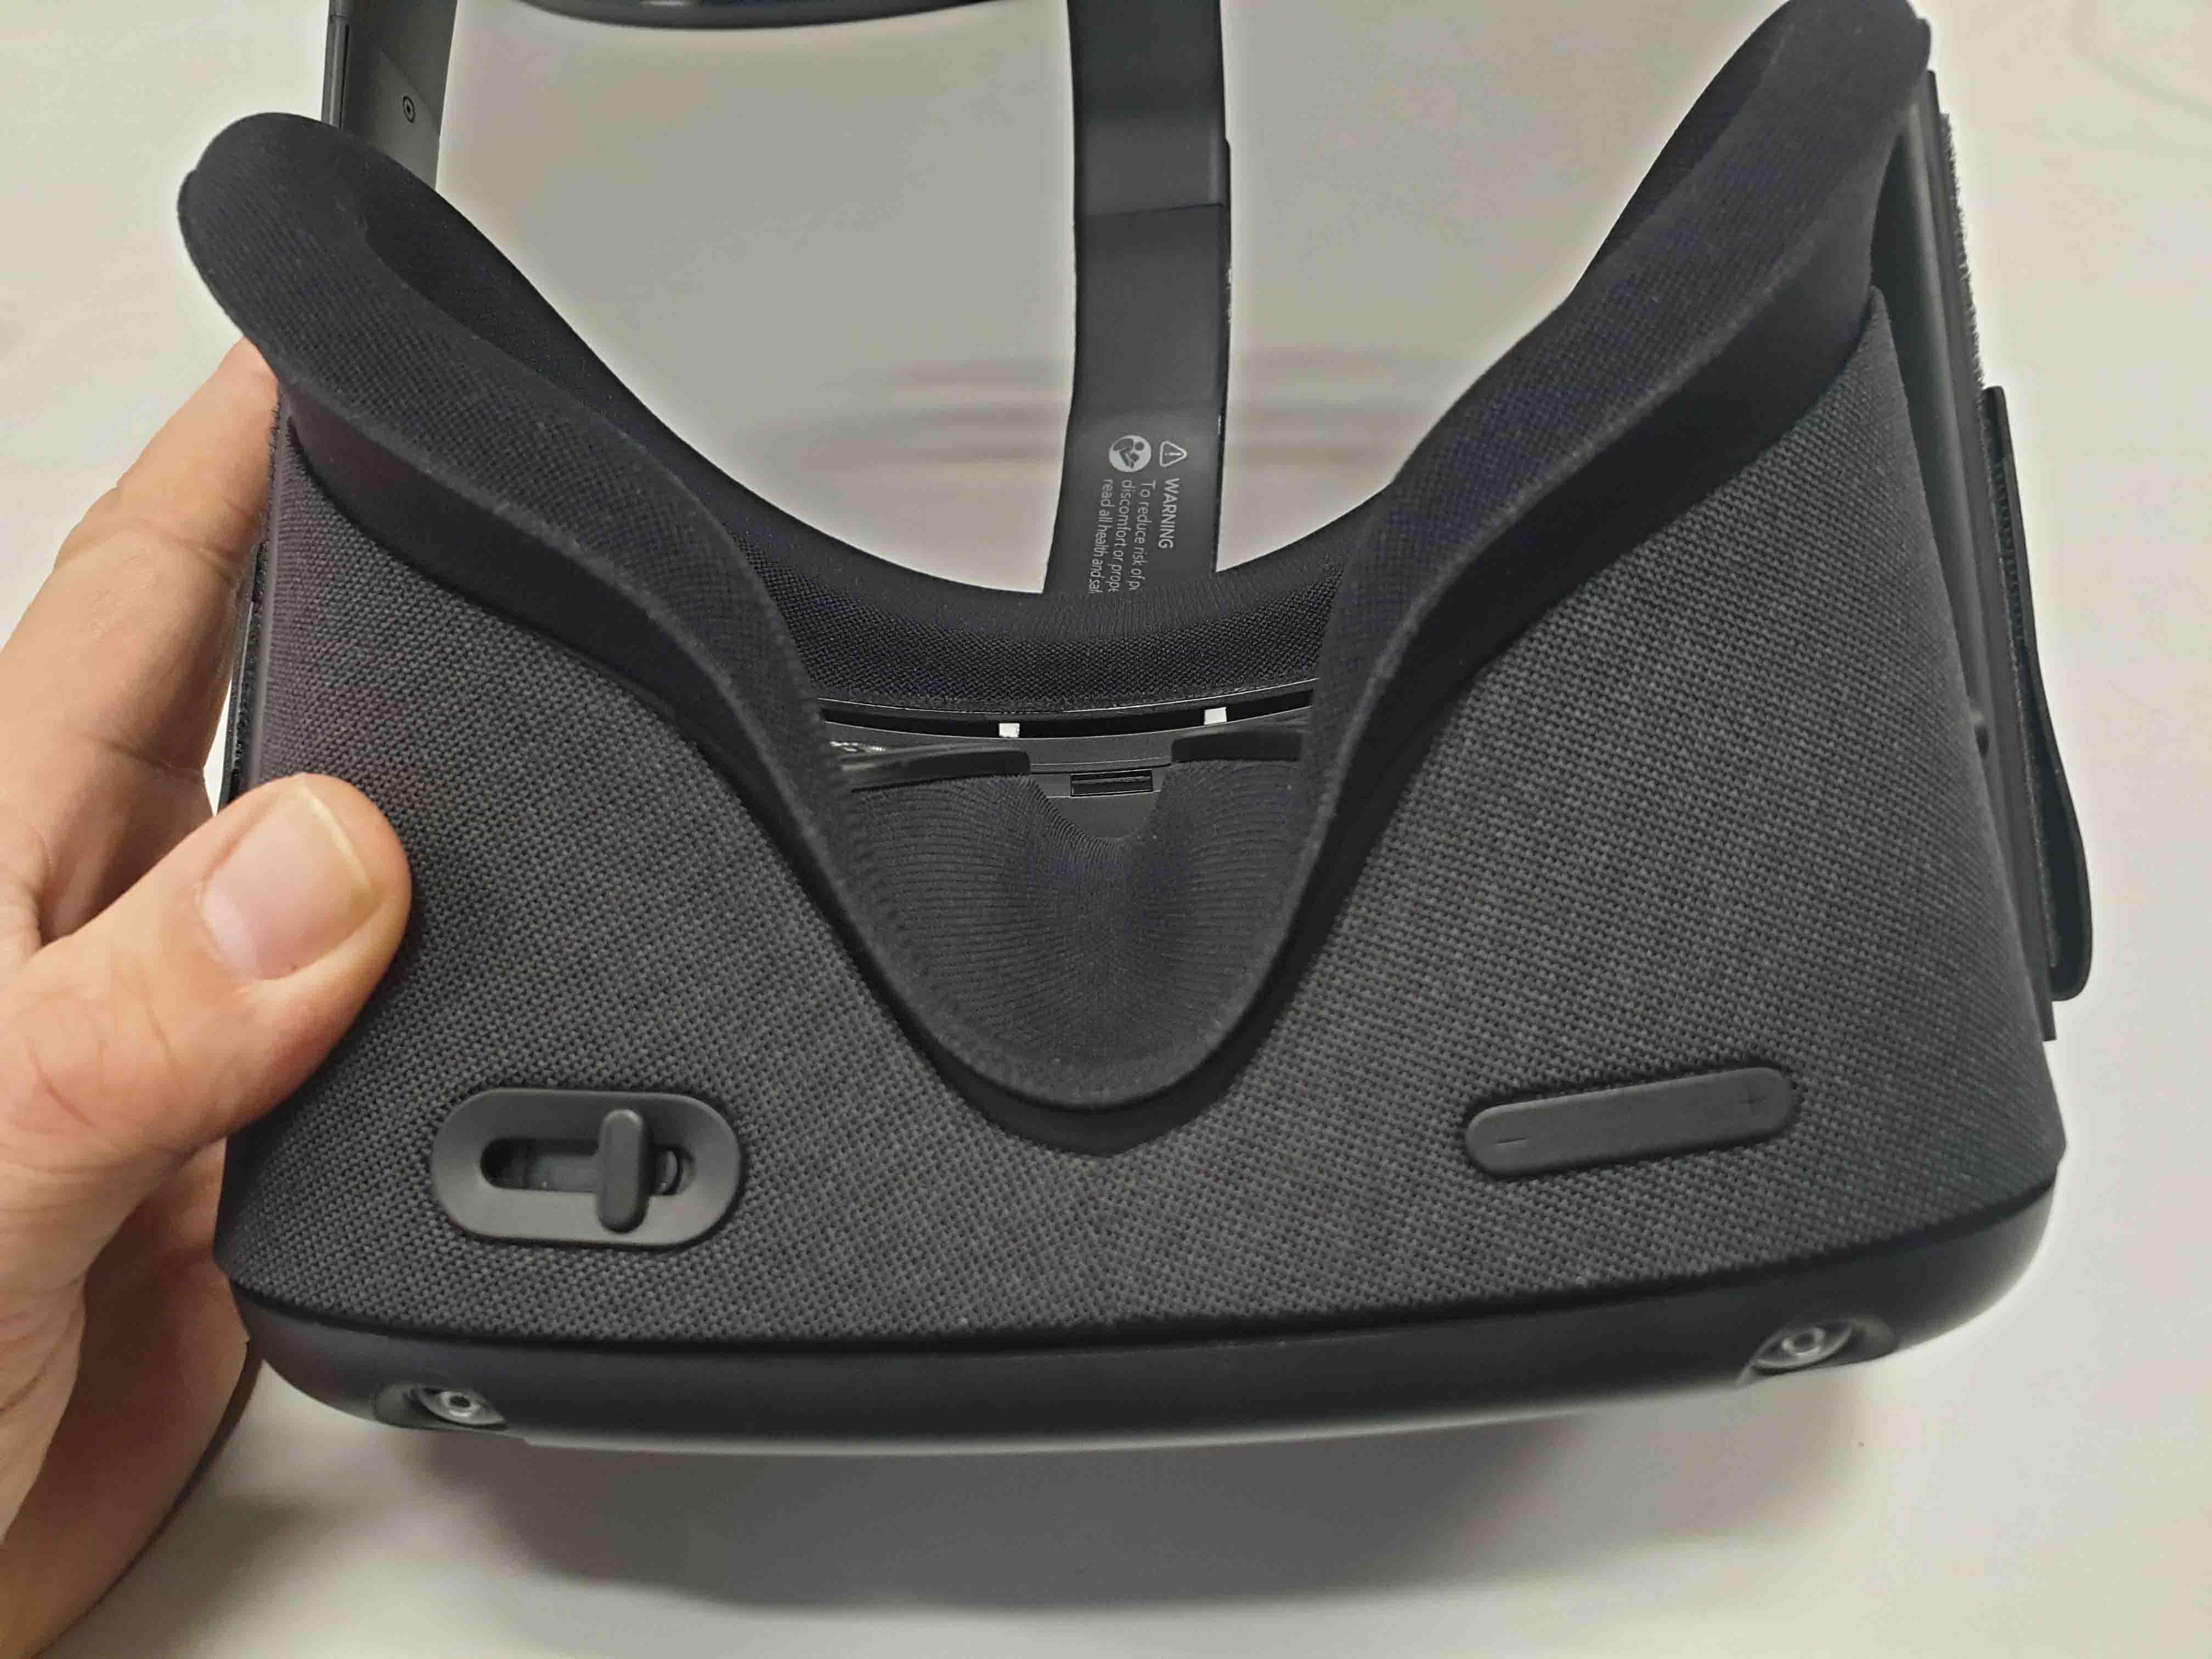 Oculus Quest detalles